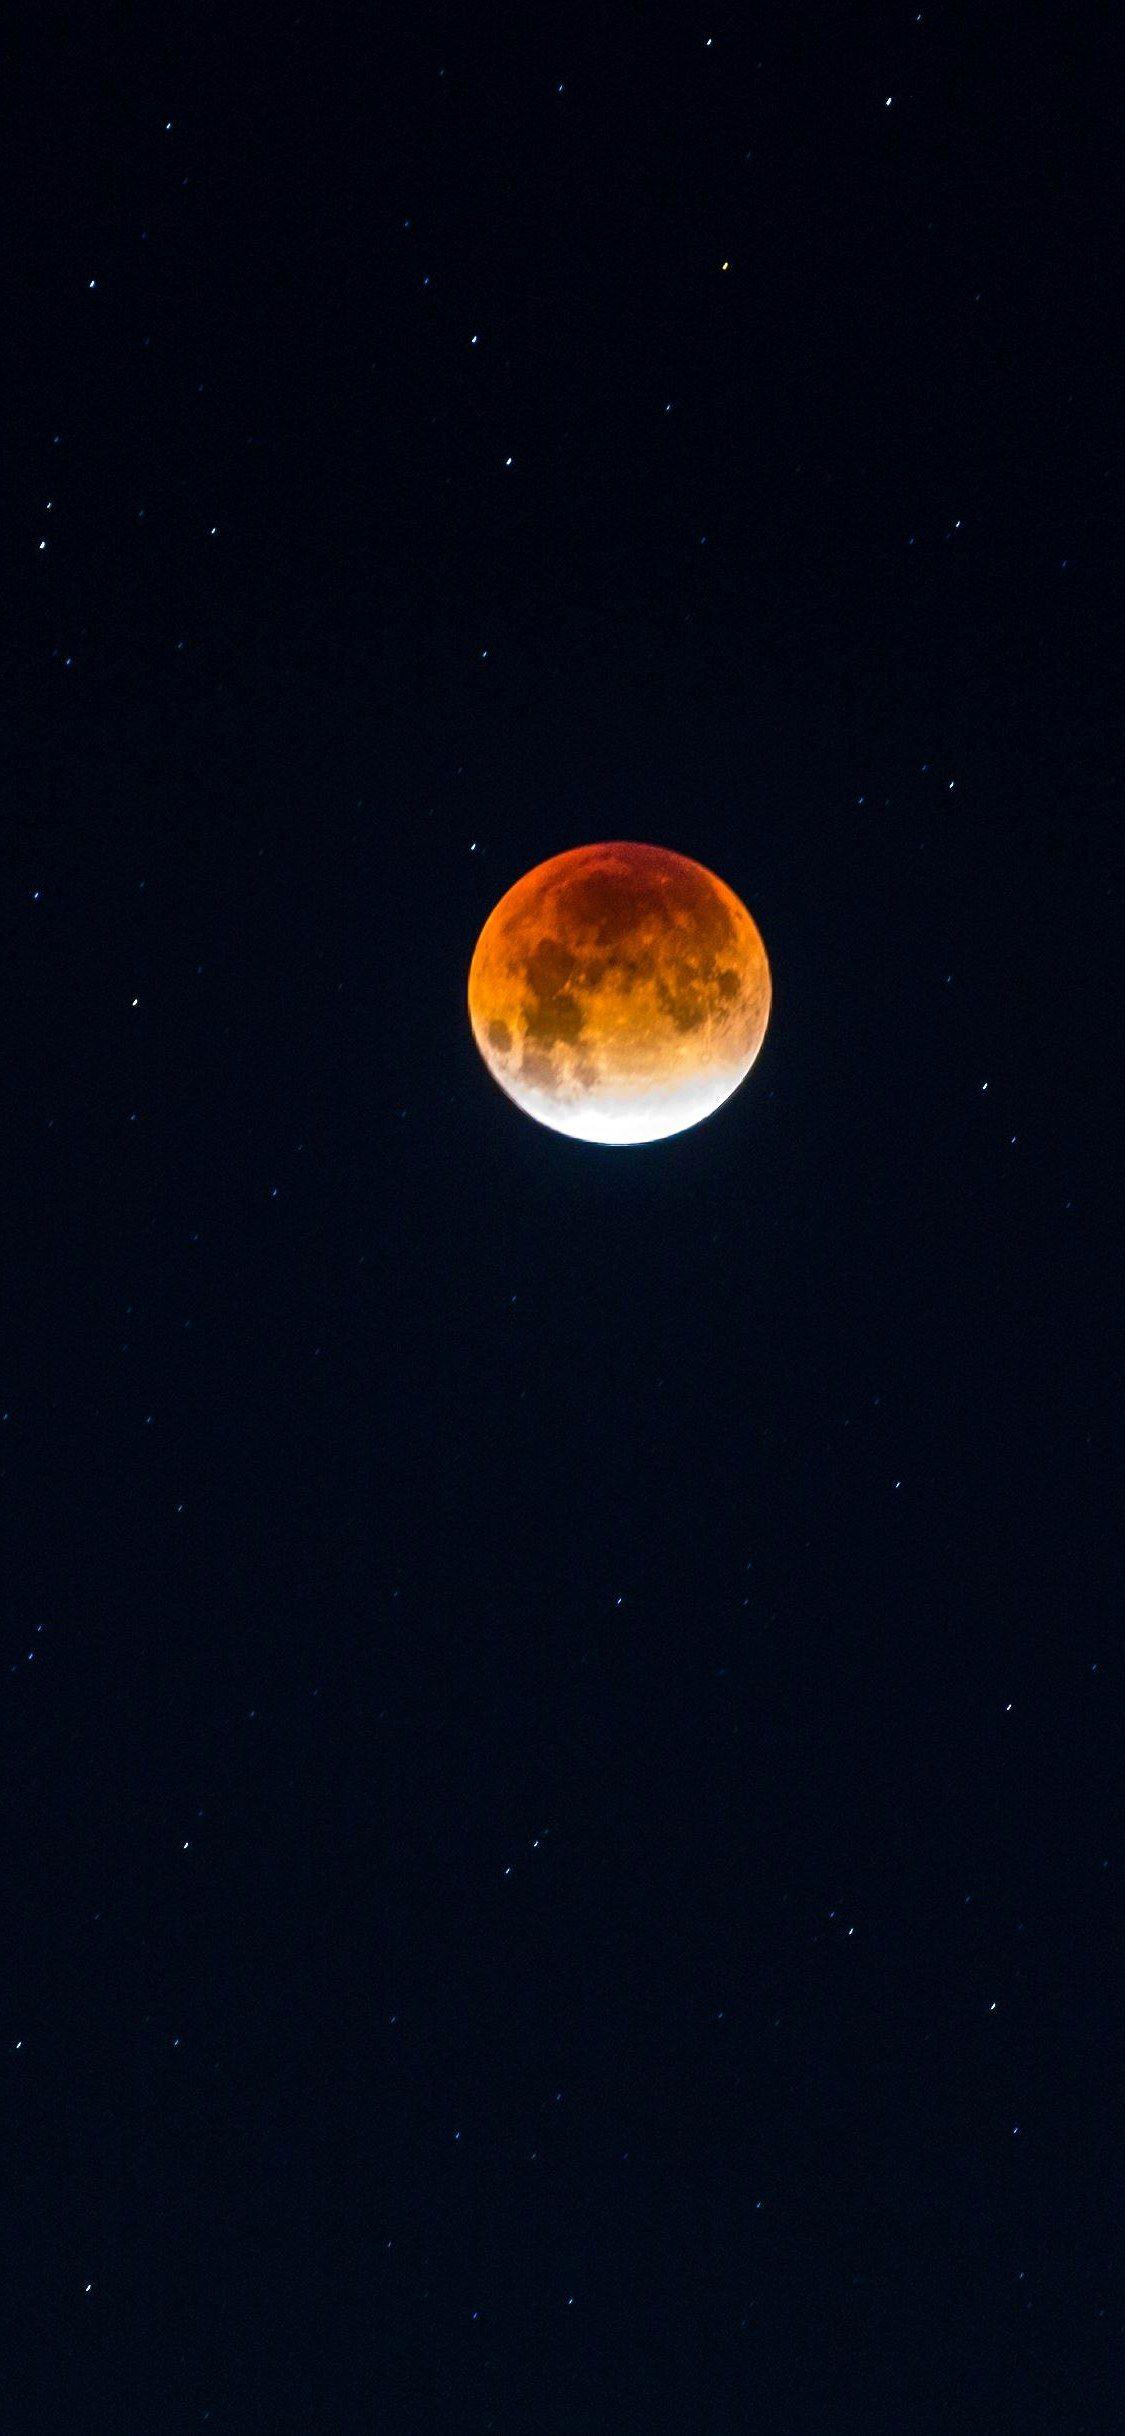 Iphone X Wallpaper Moon full moon red moon Hd in 2020